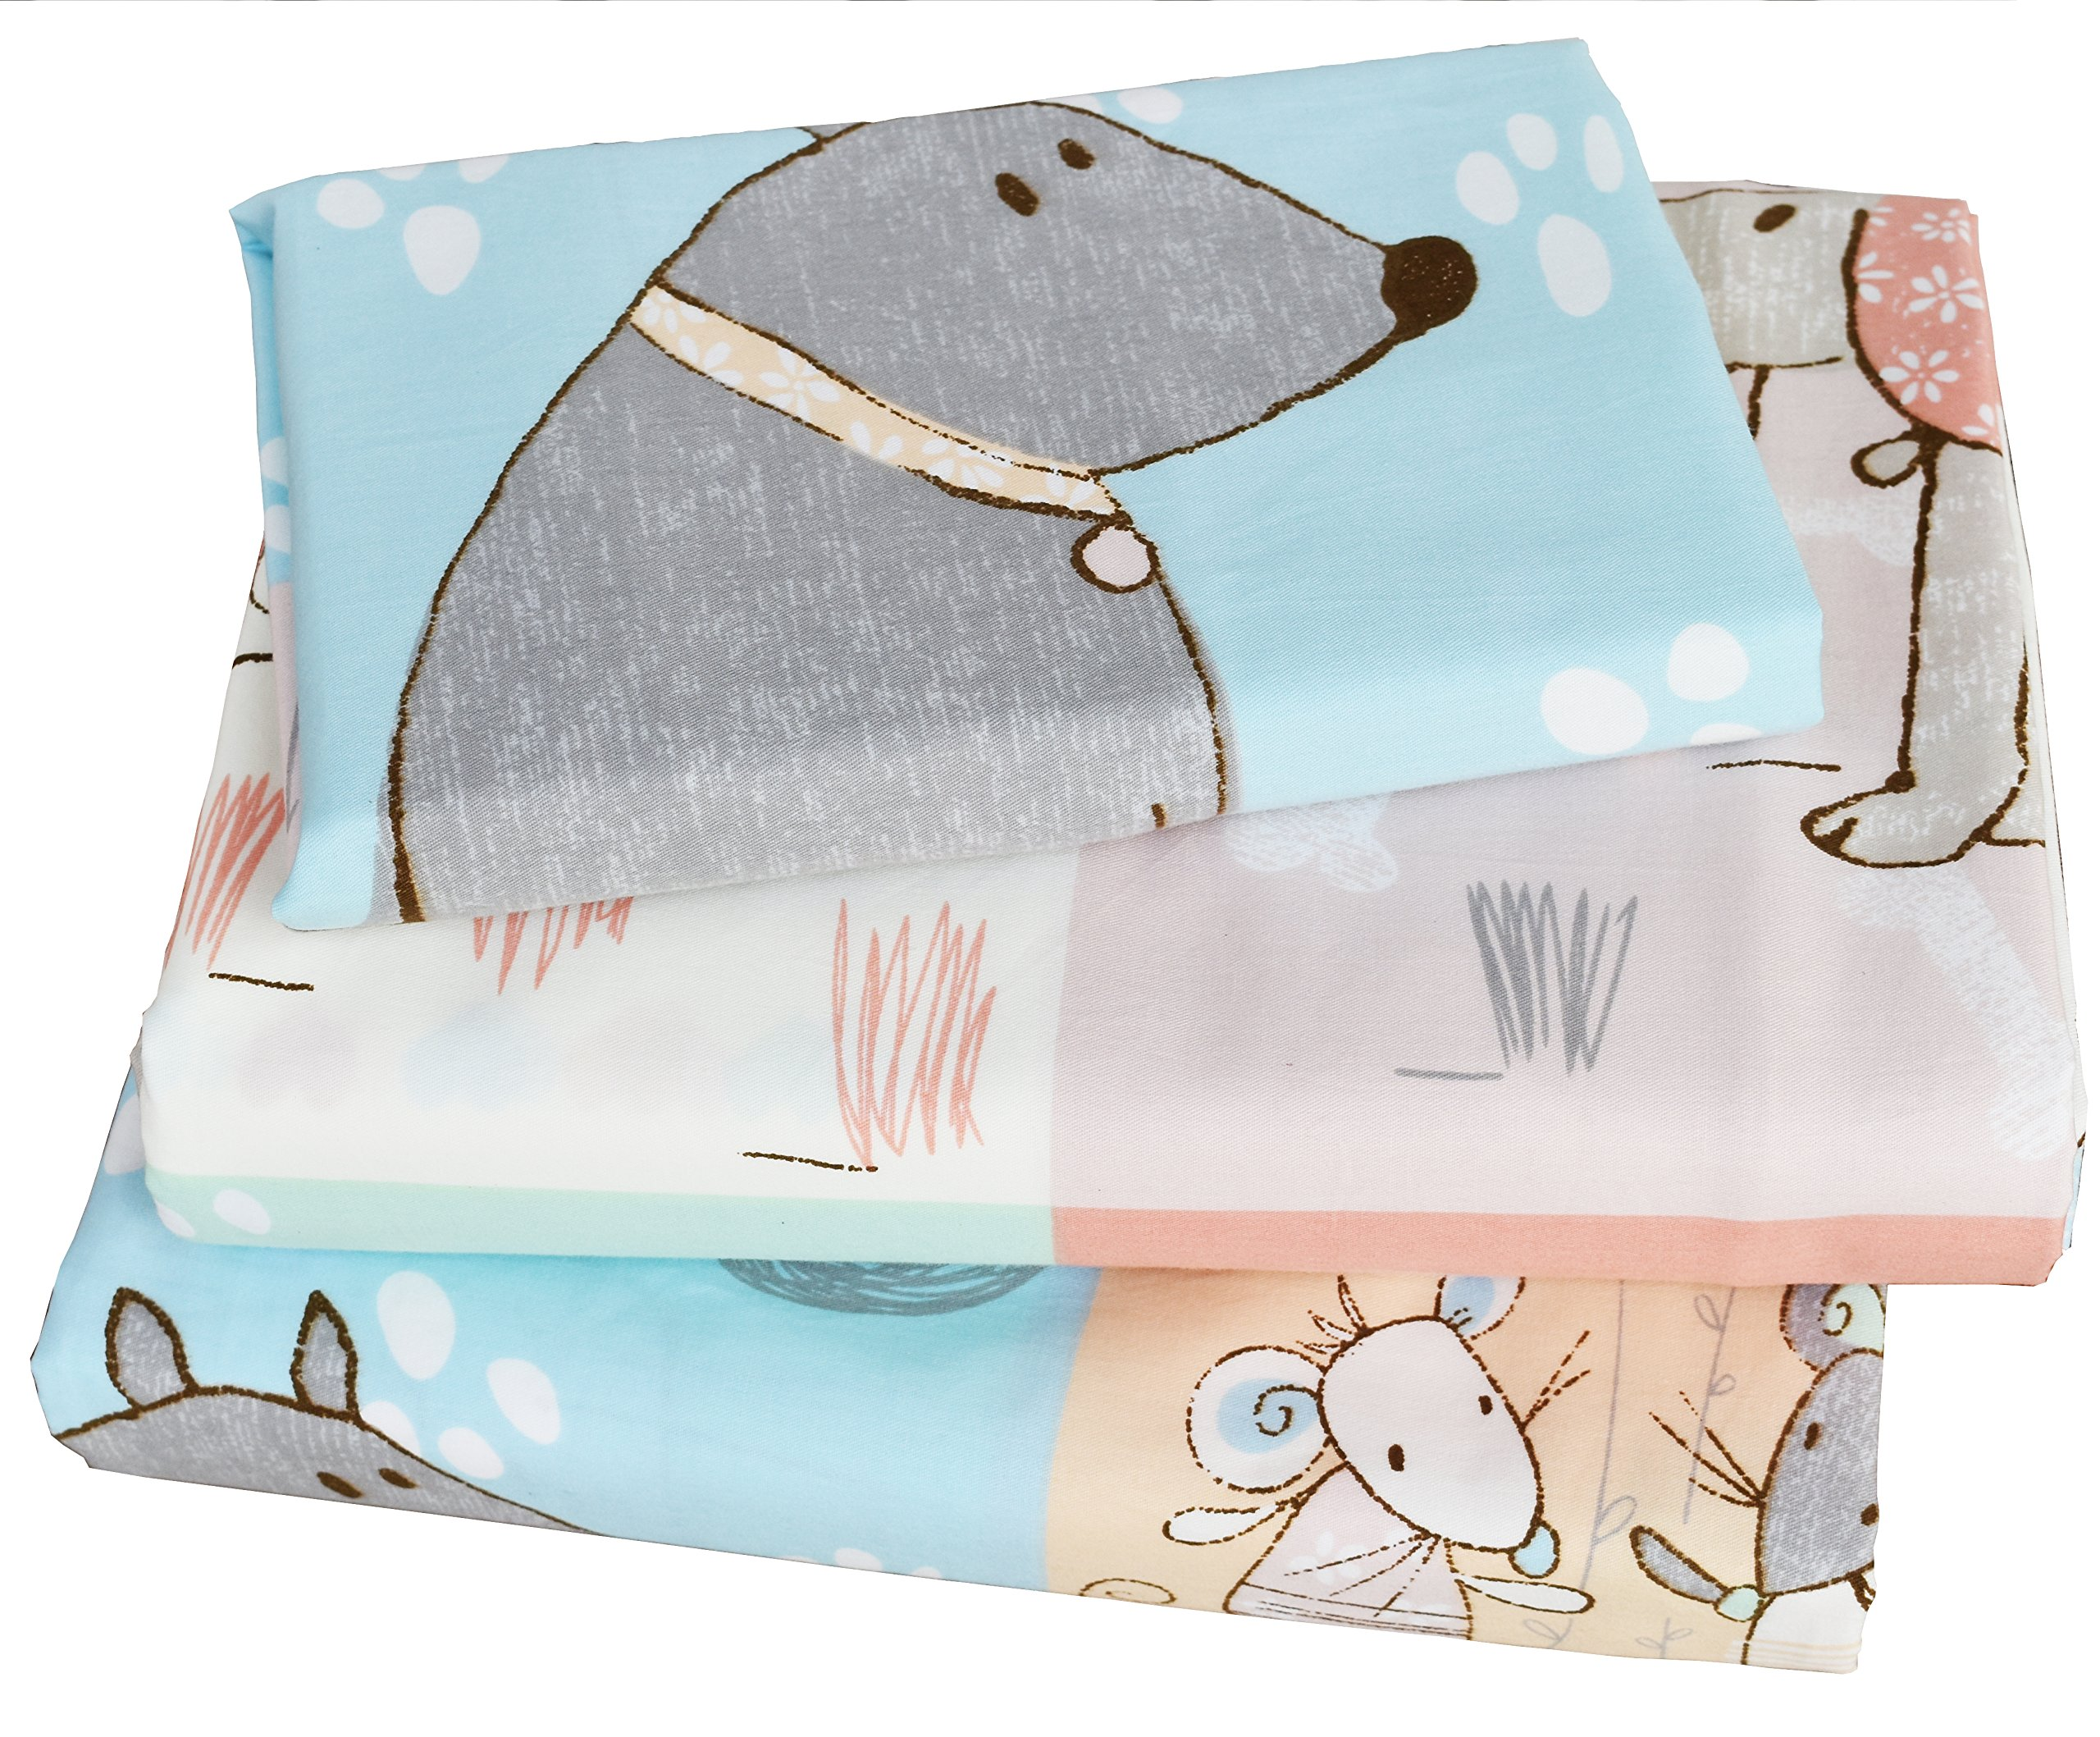 J-pinno Cute Cartoon Puppy Cat Mouse Full Sheet Set for Kids Children,100% Cotton, Flat Sheet + Fitted Sheet + Two Pillowcase Bedding Set (5)